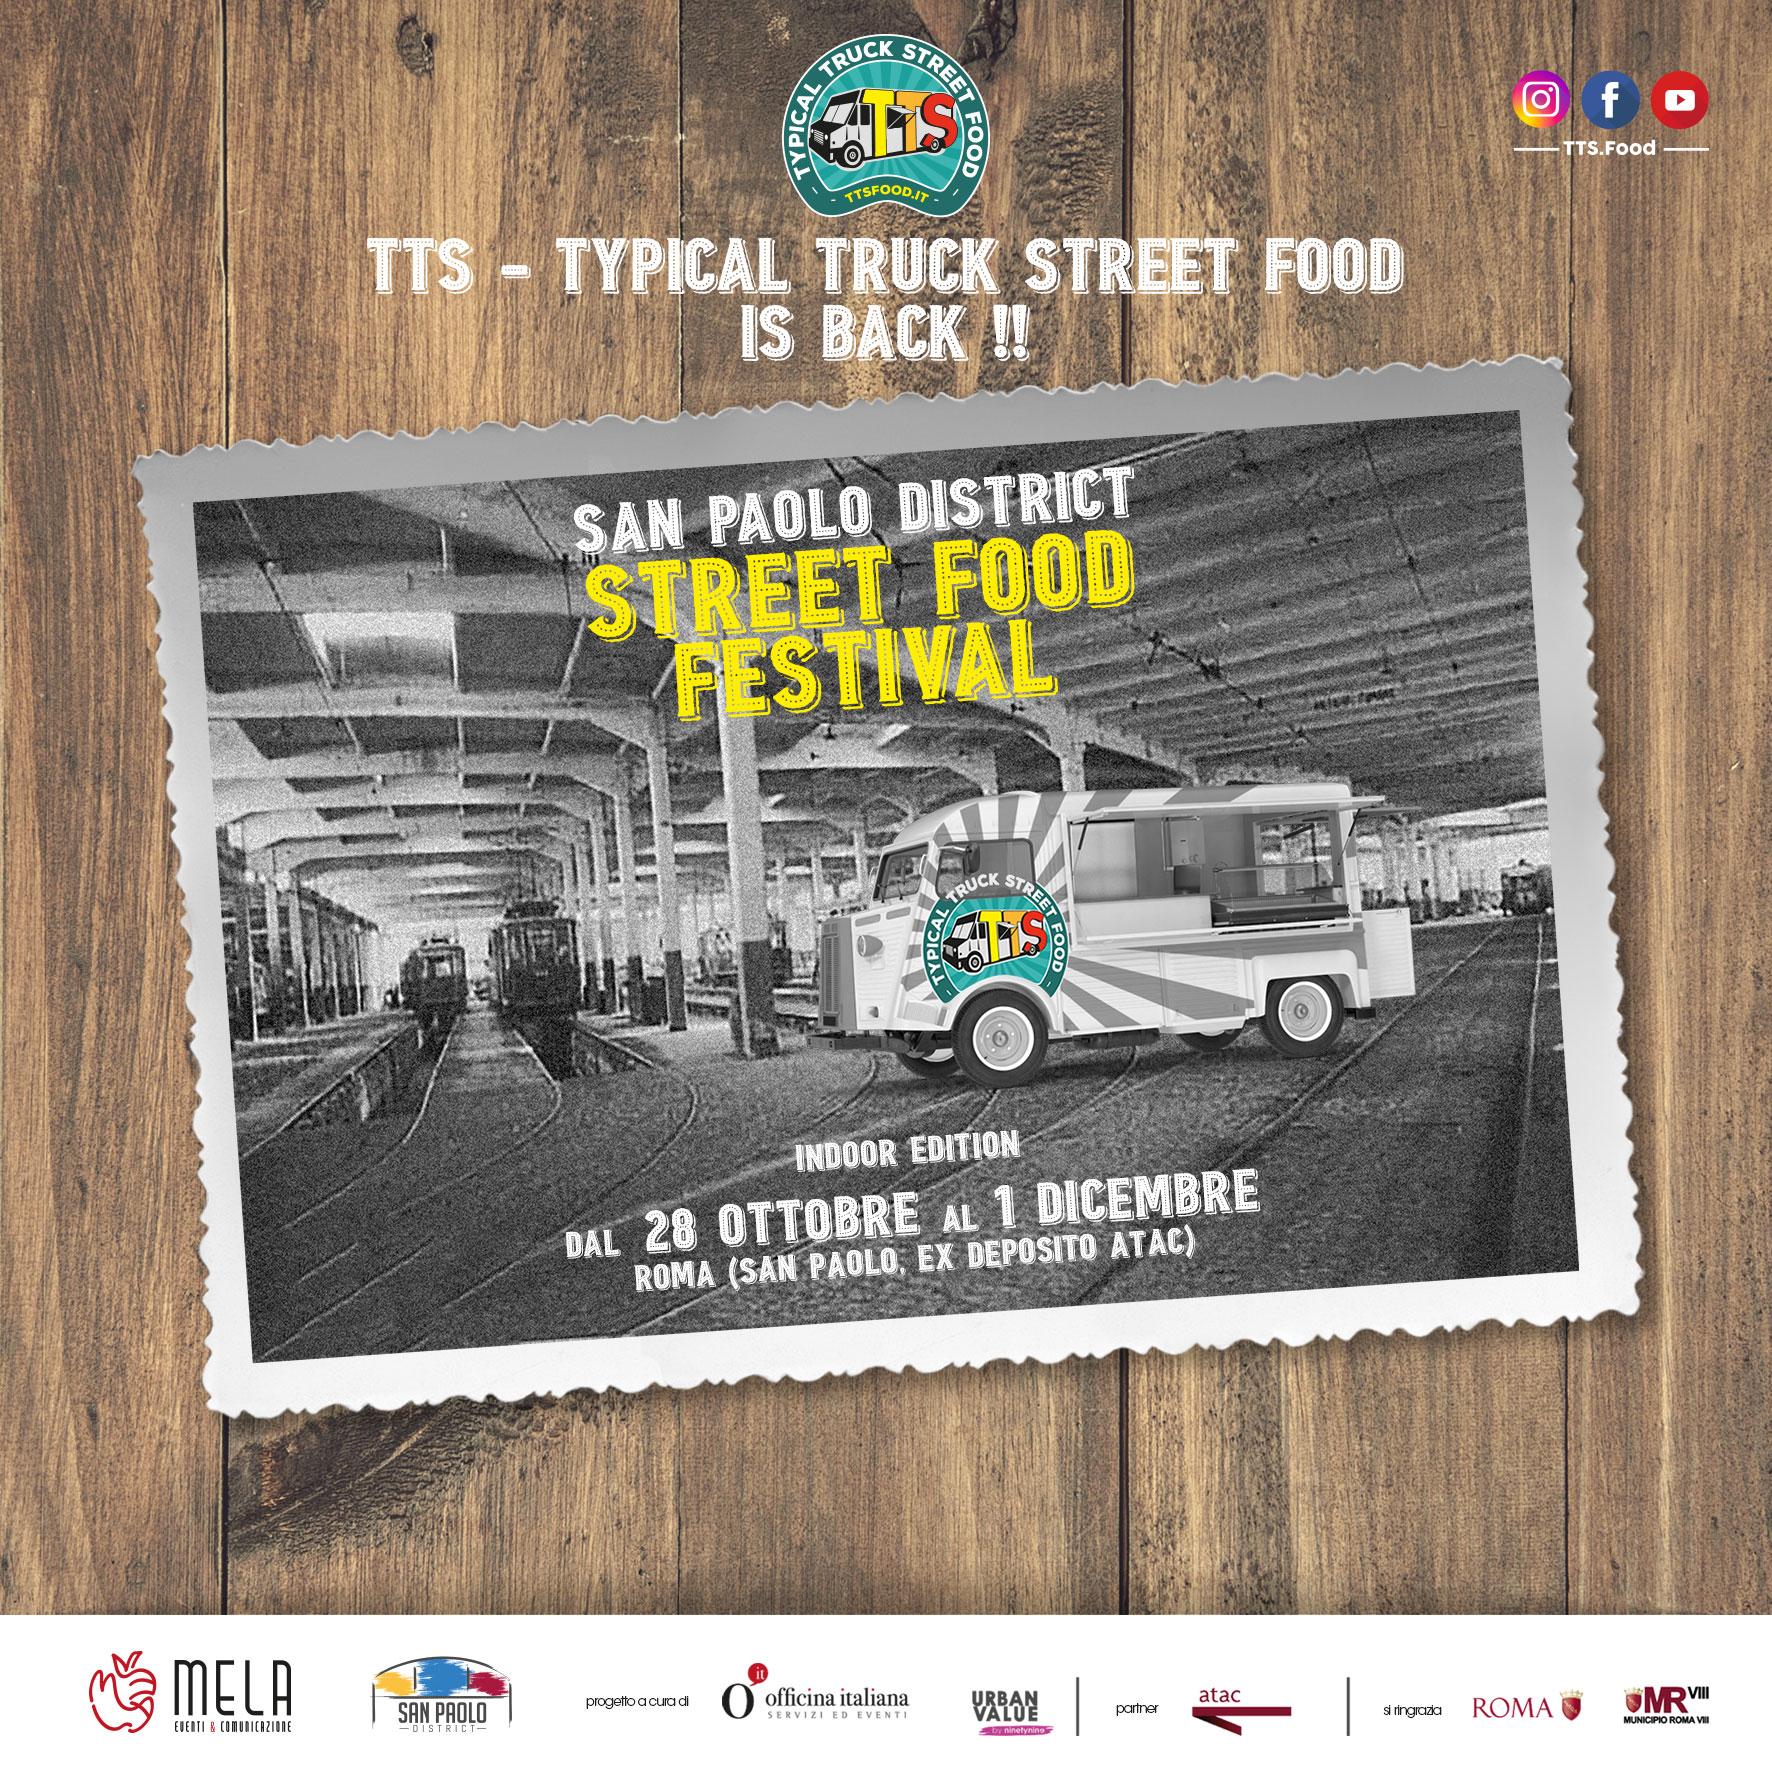 Al San Paolo District lo Street Food Festival 'indoor' di Roma